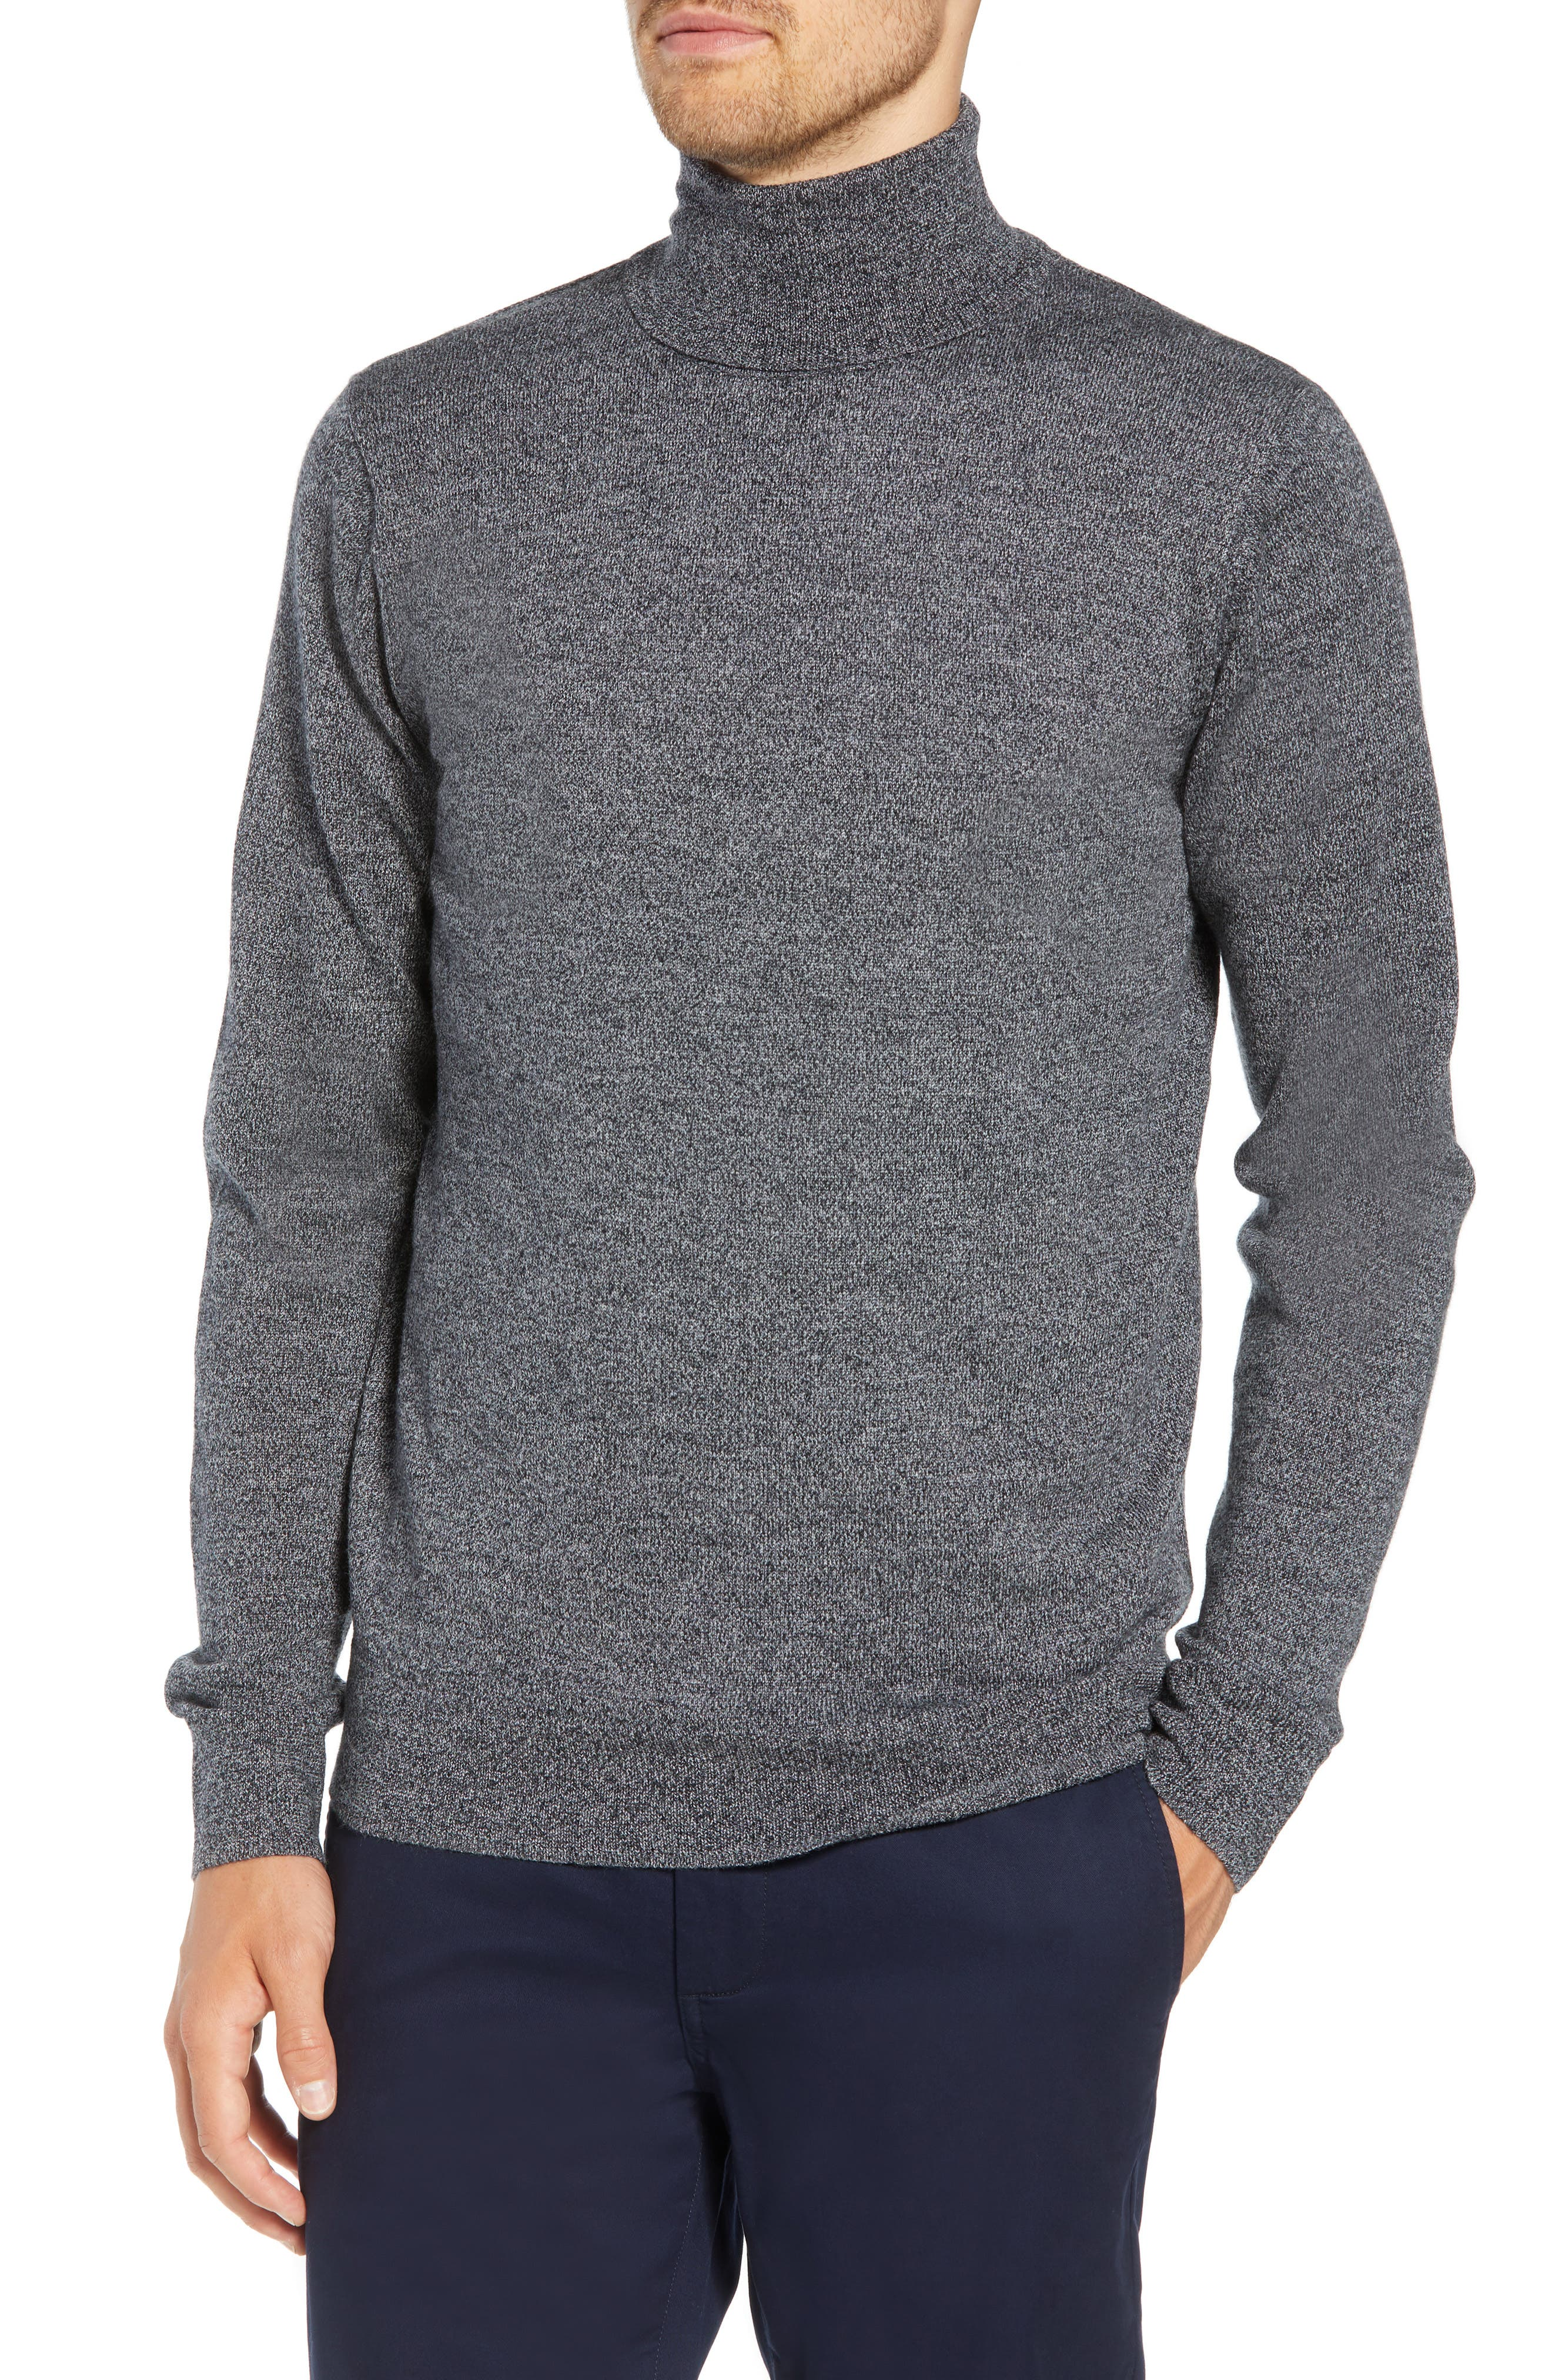 Slim Fit Turtleneck Merino Wool Sweater,                         Main,                         color, CHARCOAL MARL